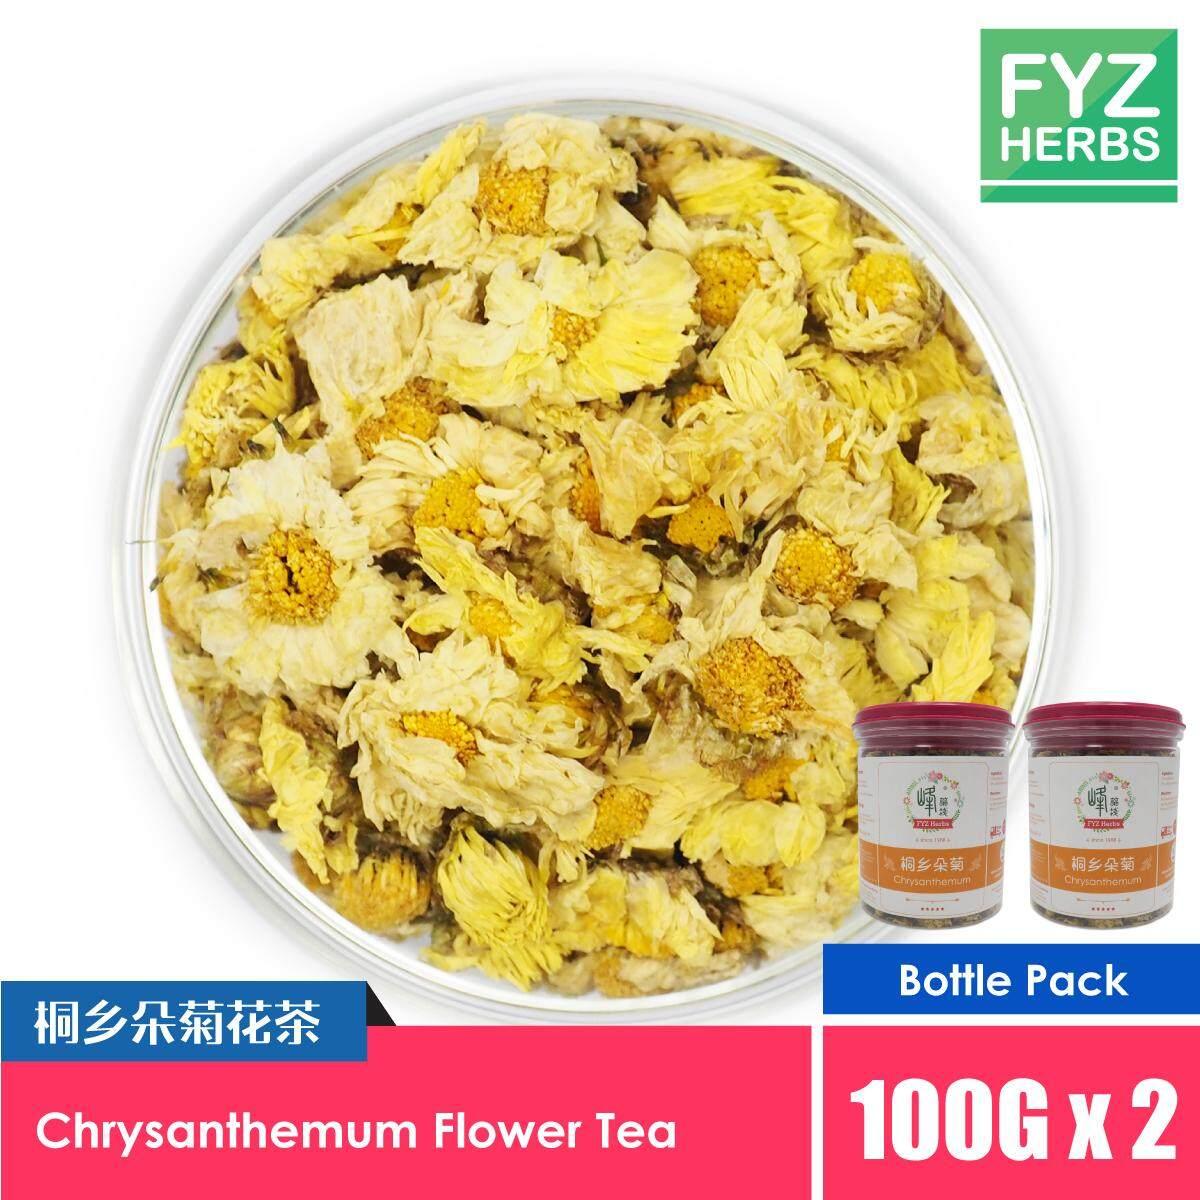 FYZ Herbs Chrysanthemum Flower Tea (100g x 2) [Bottle Pack] 桐乡朵菊罐装 (100g x 2)